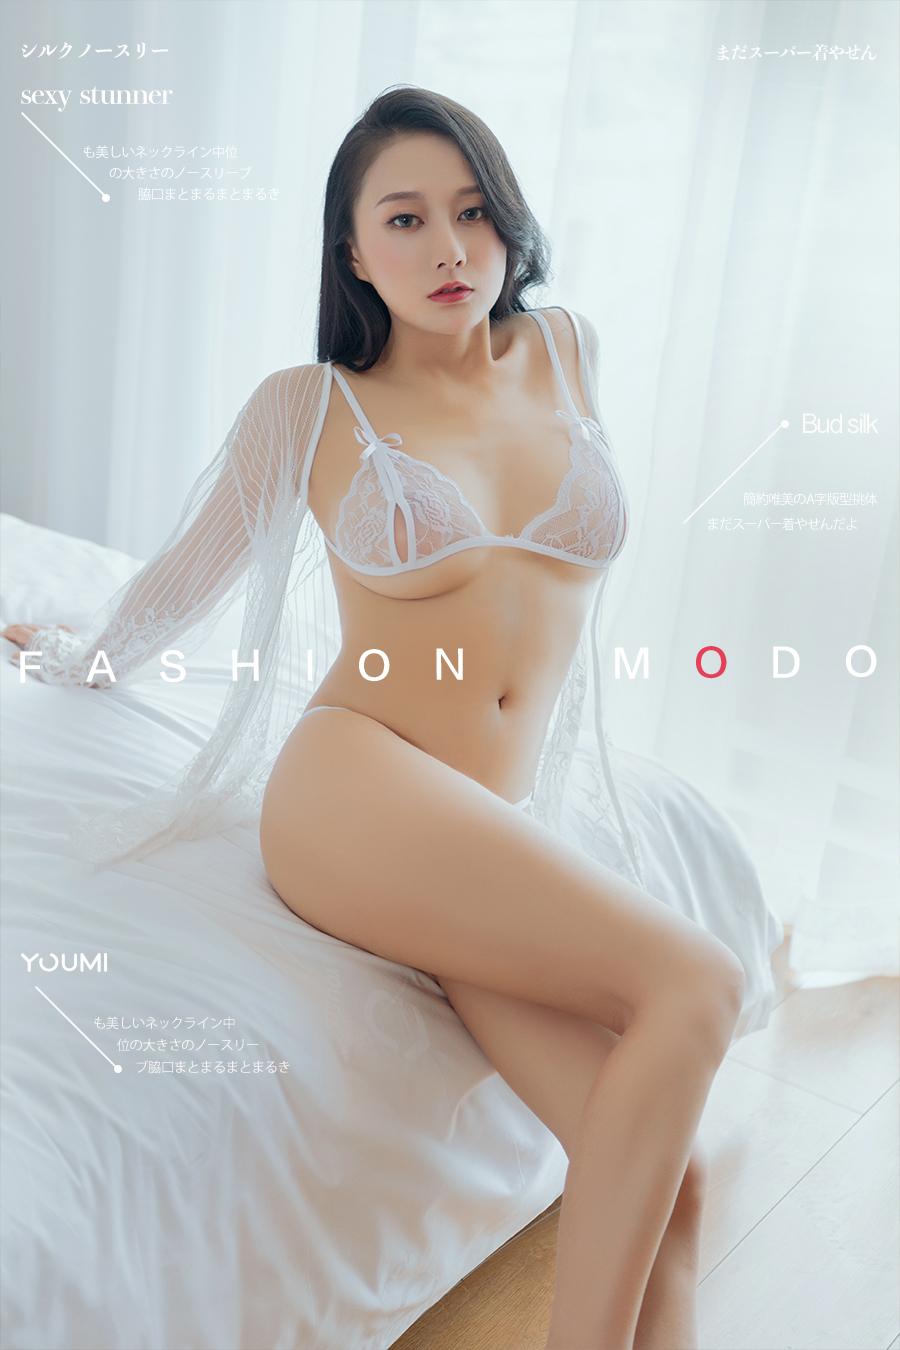 [YouMi尤蜜]2020.01.16 蕾丝奇缘 何嘉颖[/17MB]